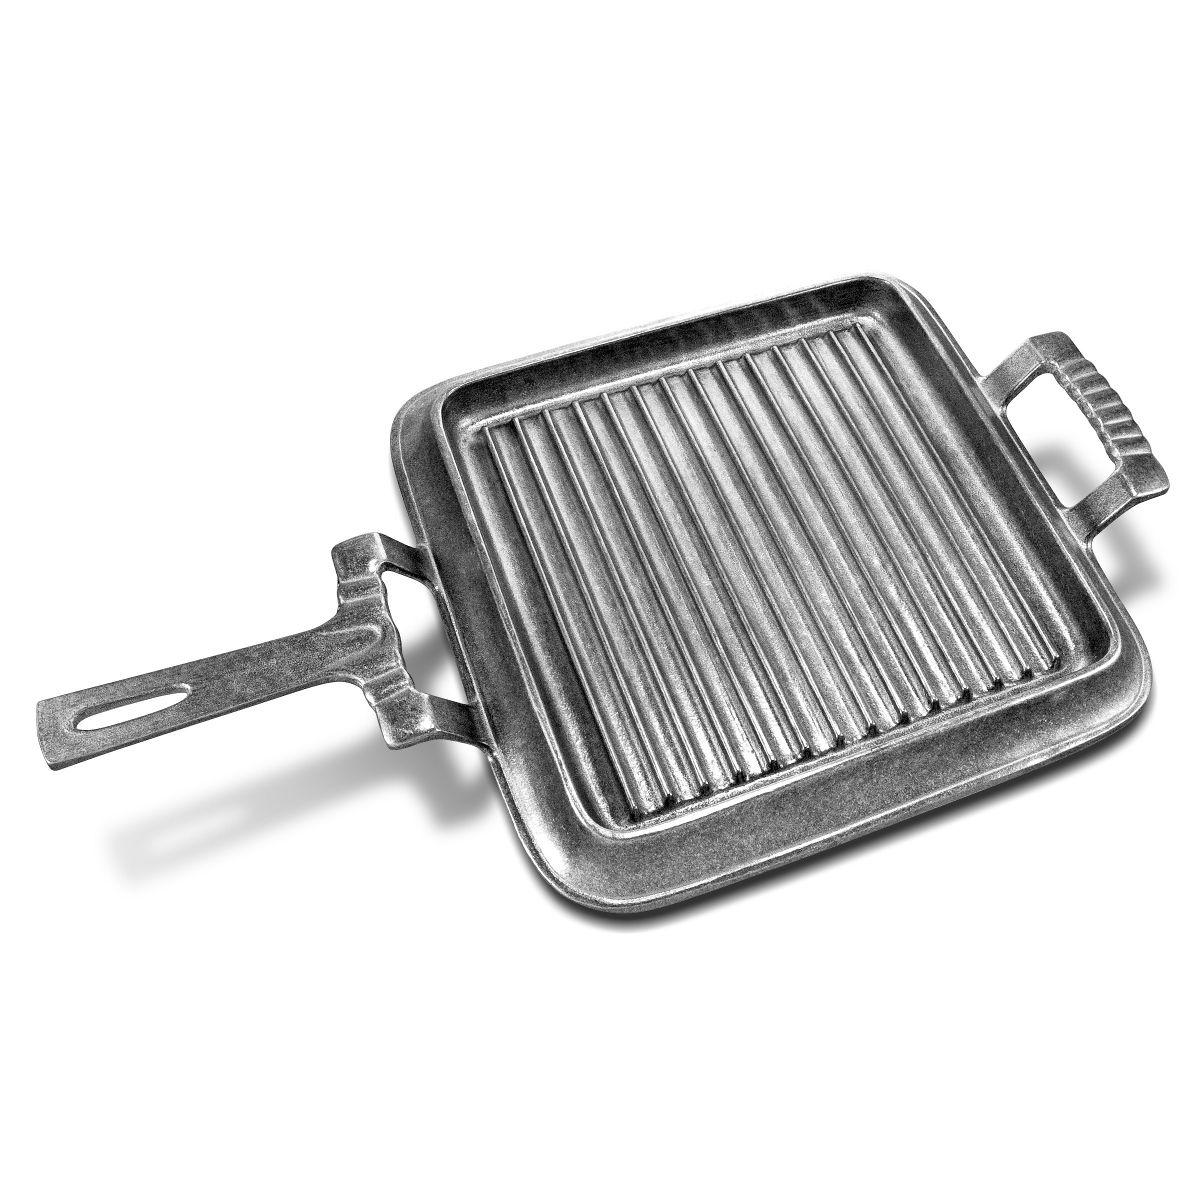 Grillware Square Griddle With Handles Wilton Armetale Wilton